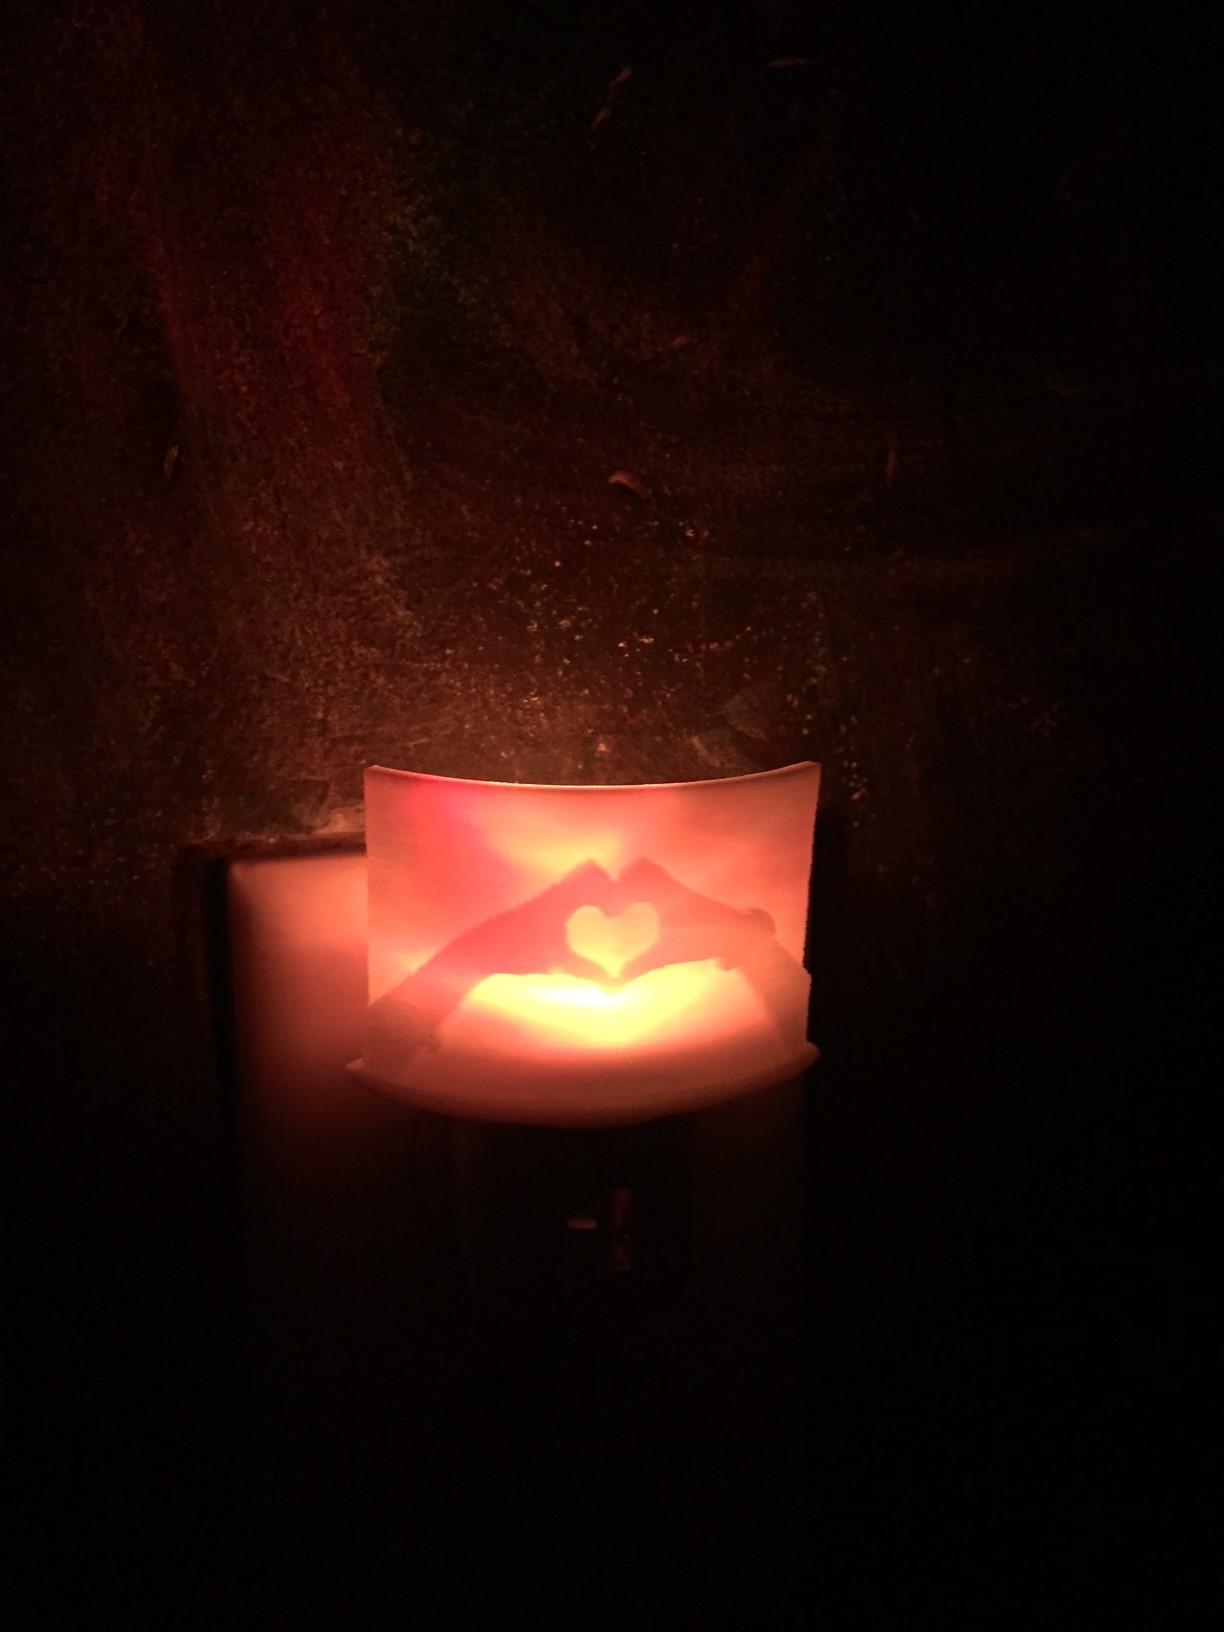 lithophane night light qll lit up